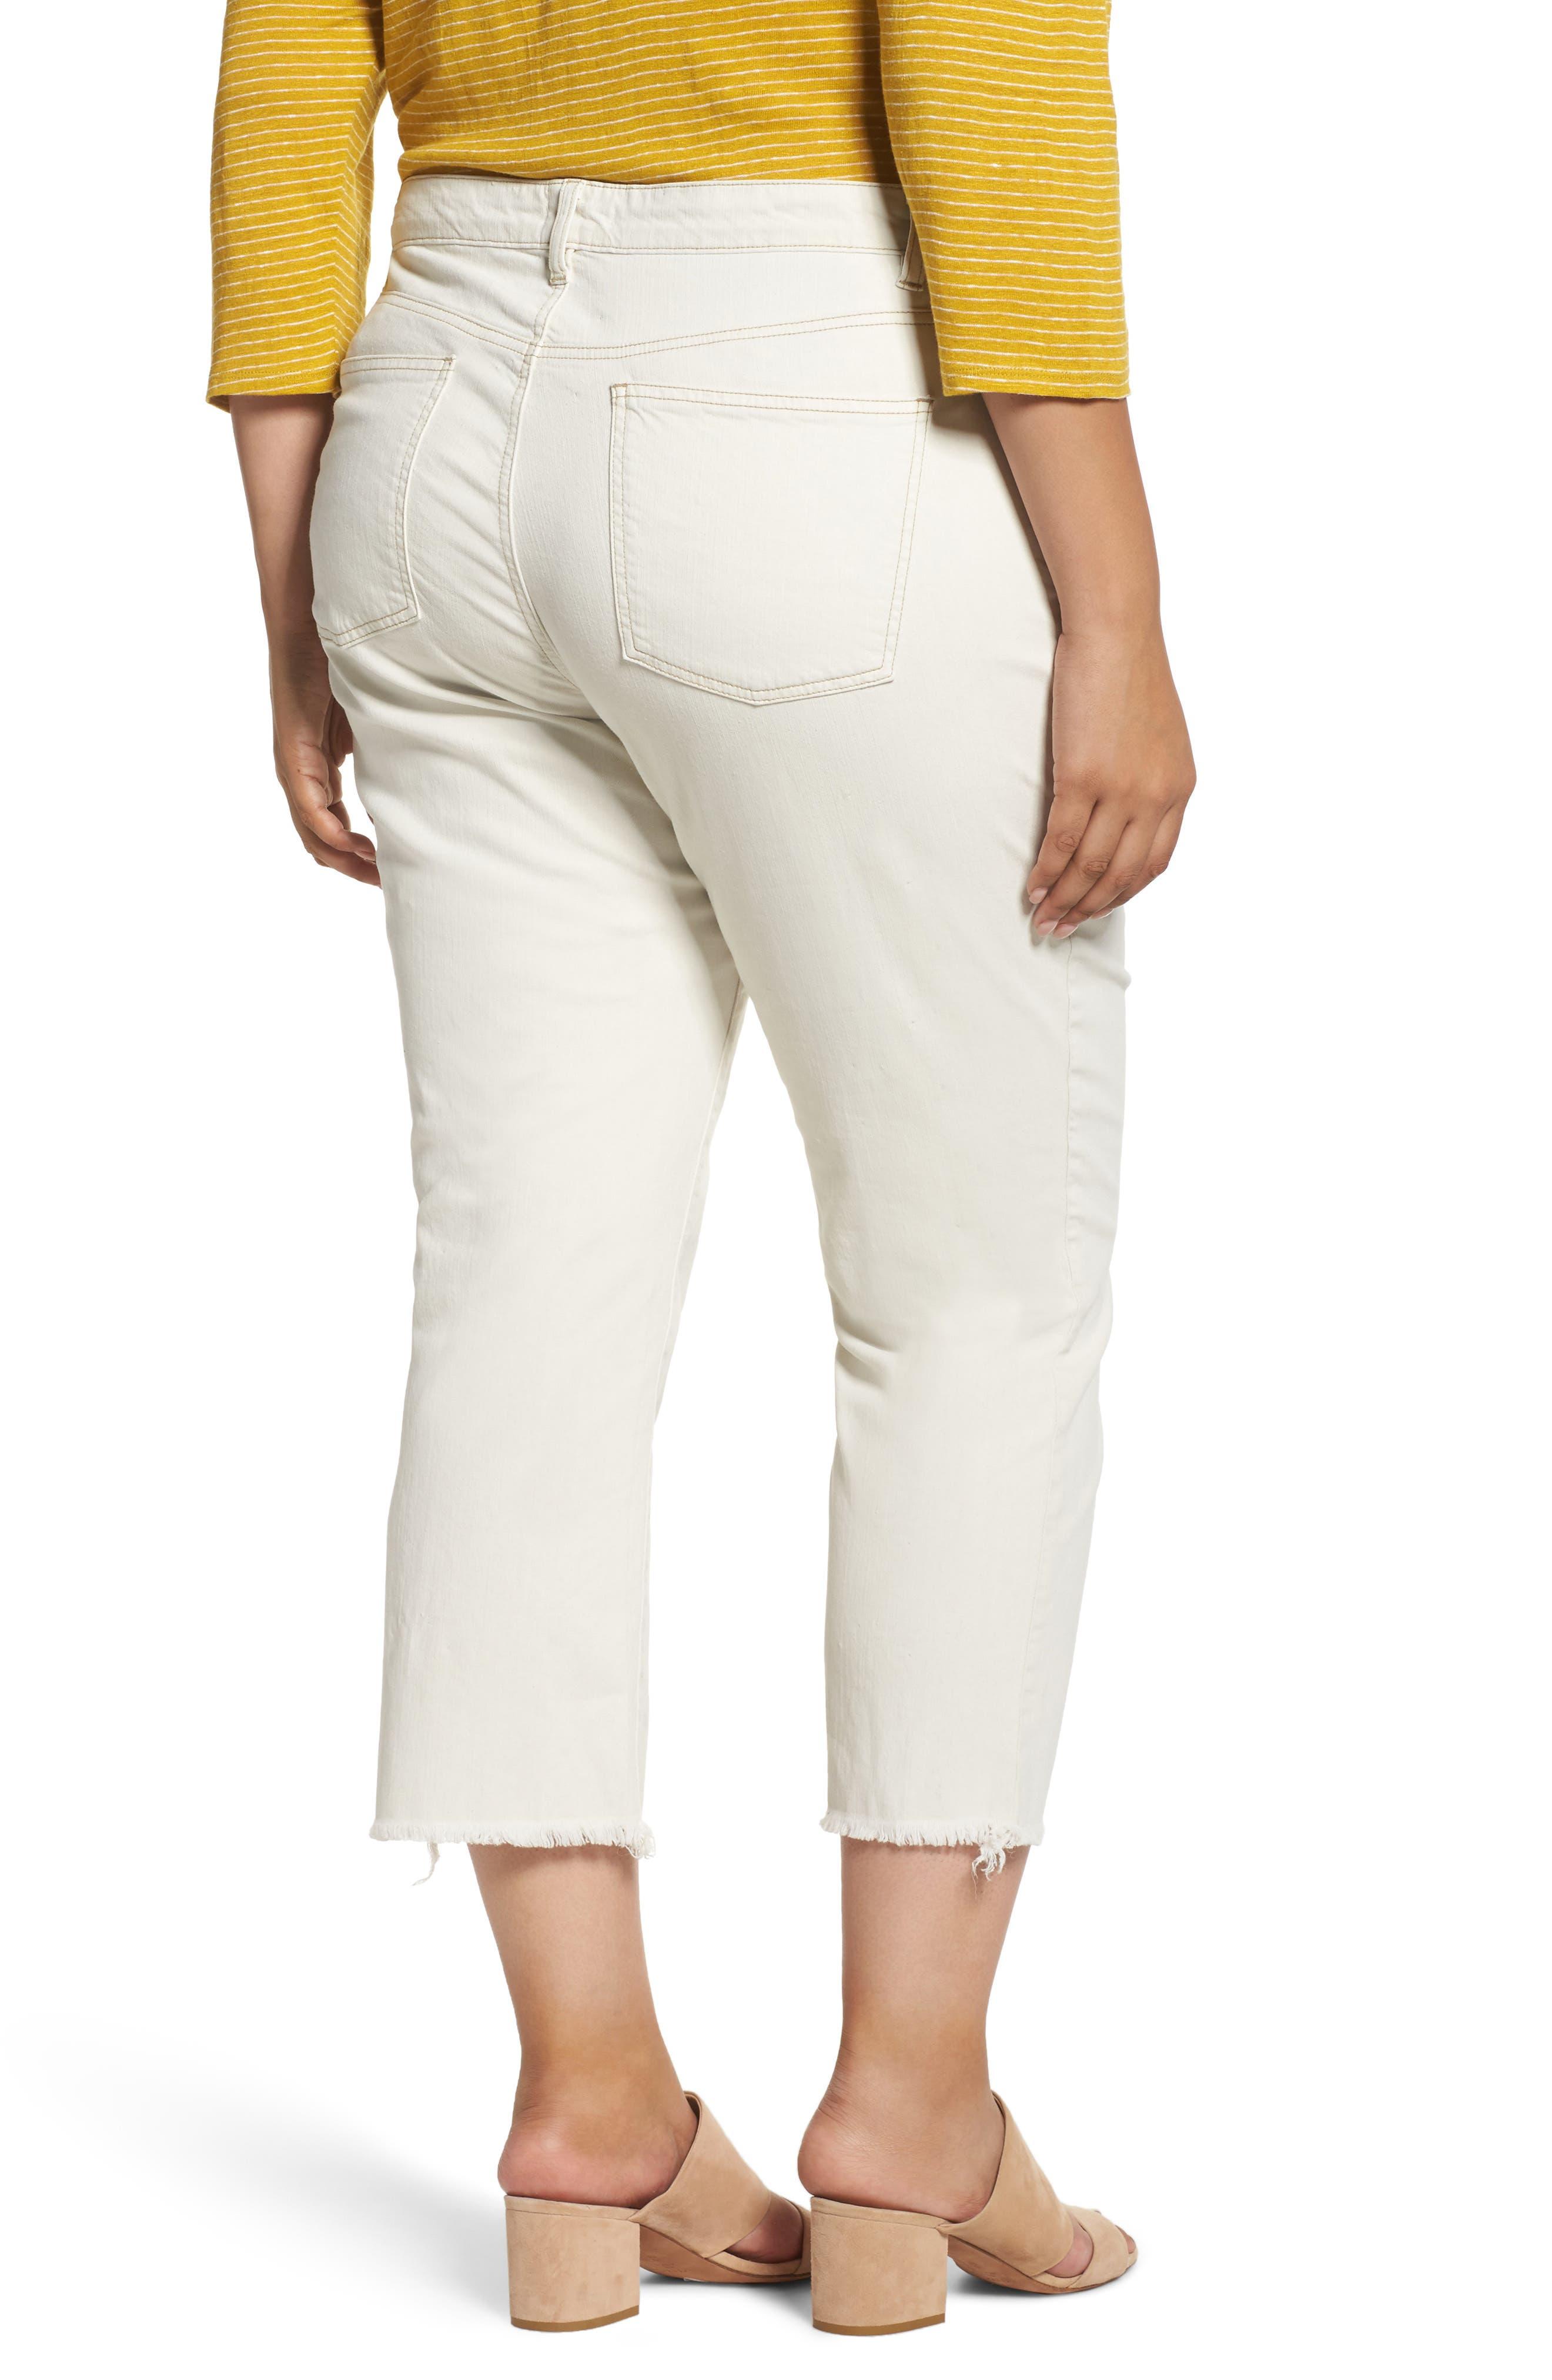 Stretch Organic Denim Crop Jeans,                             Alternate thumbnail 2, color,                             251